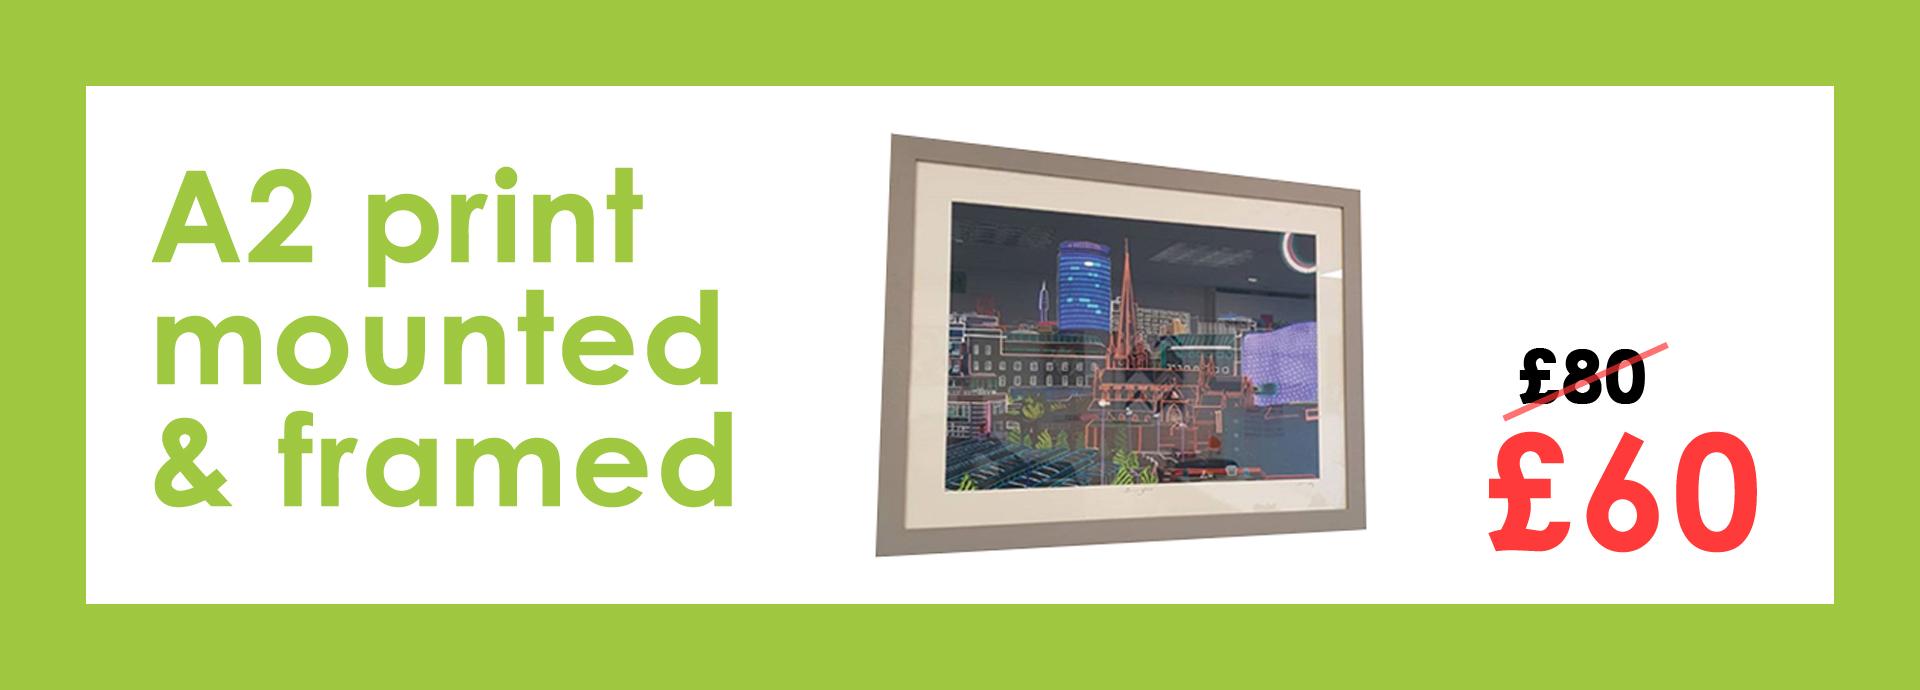 A2 Print Mounted & Framed Offer